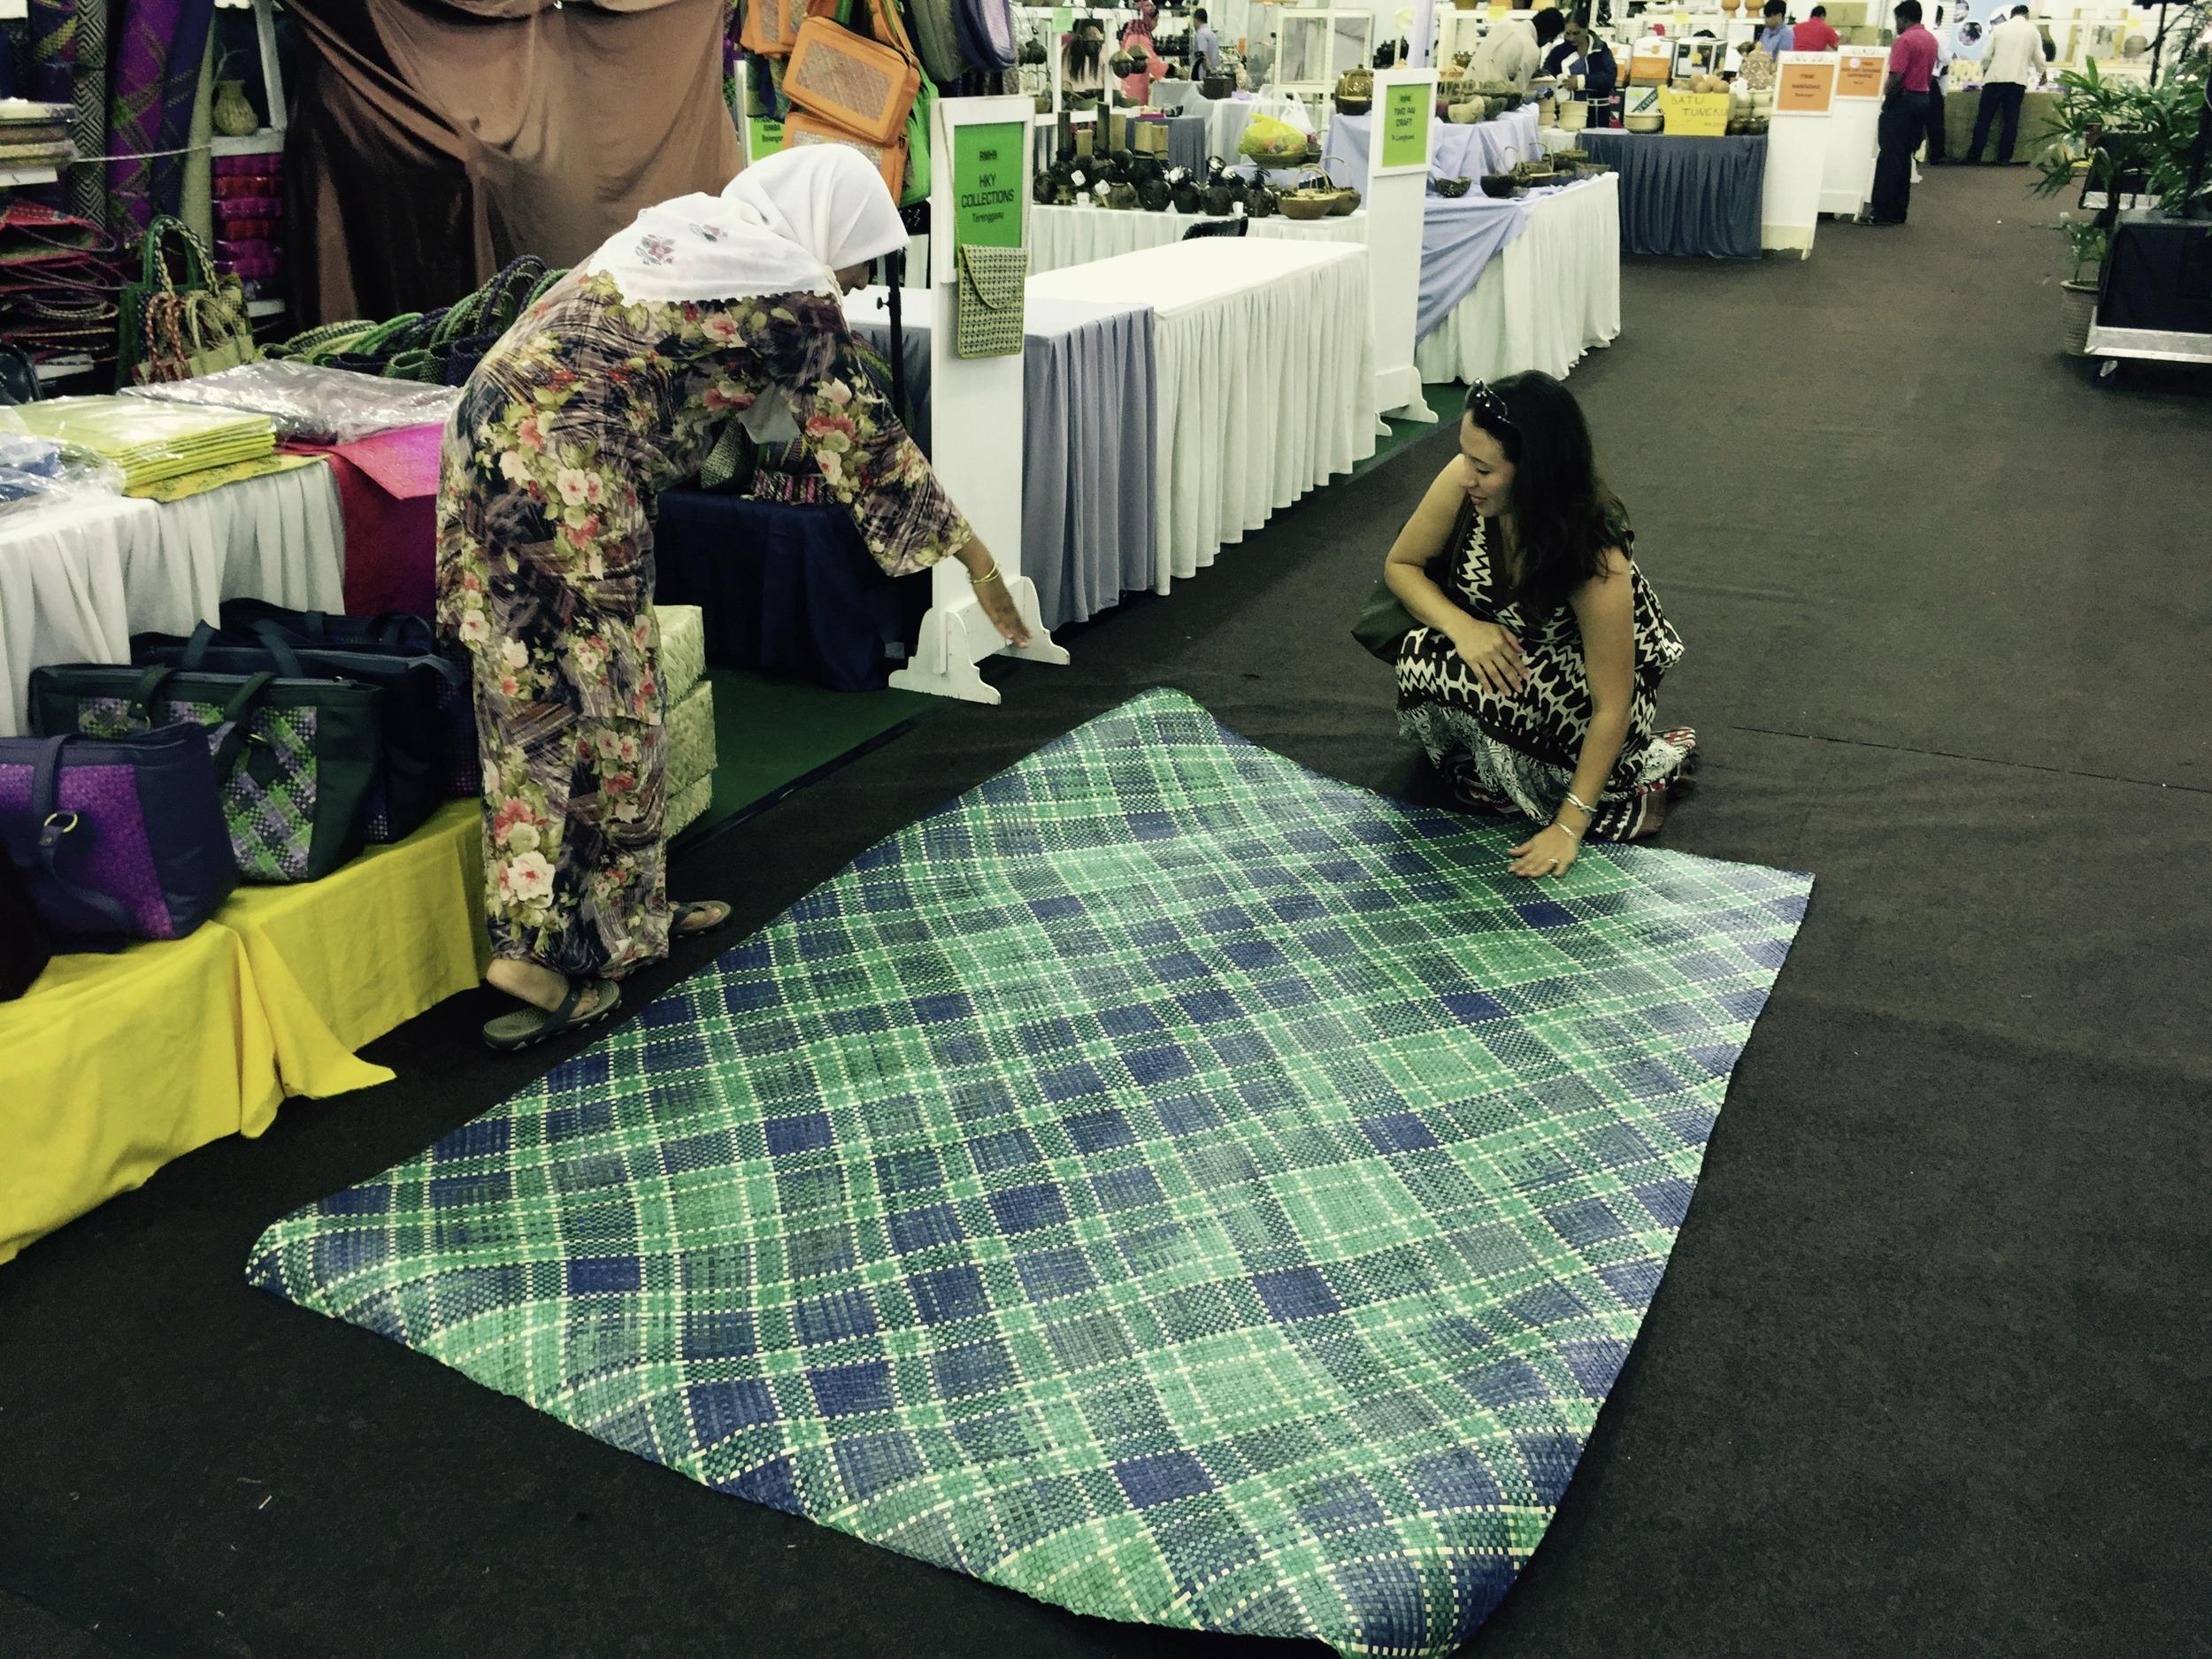 Yiga admiring this beautiful handwoven green and blue rattan floor mat from Terengganu, Malaysia.